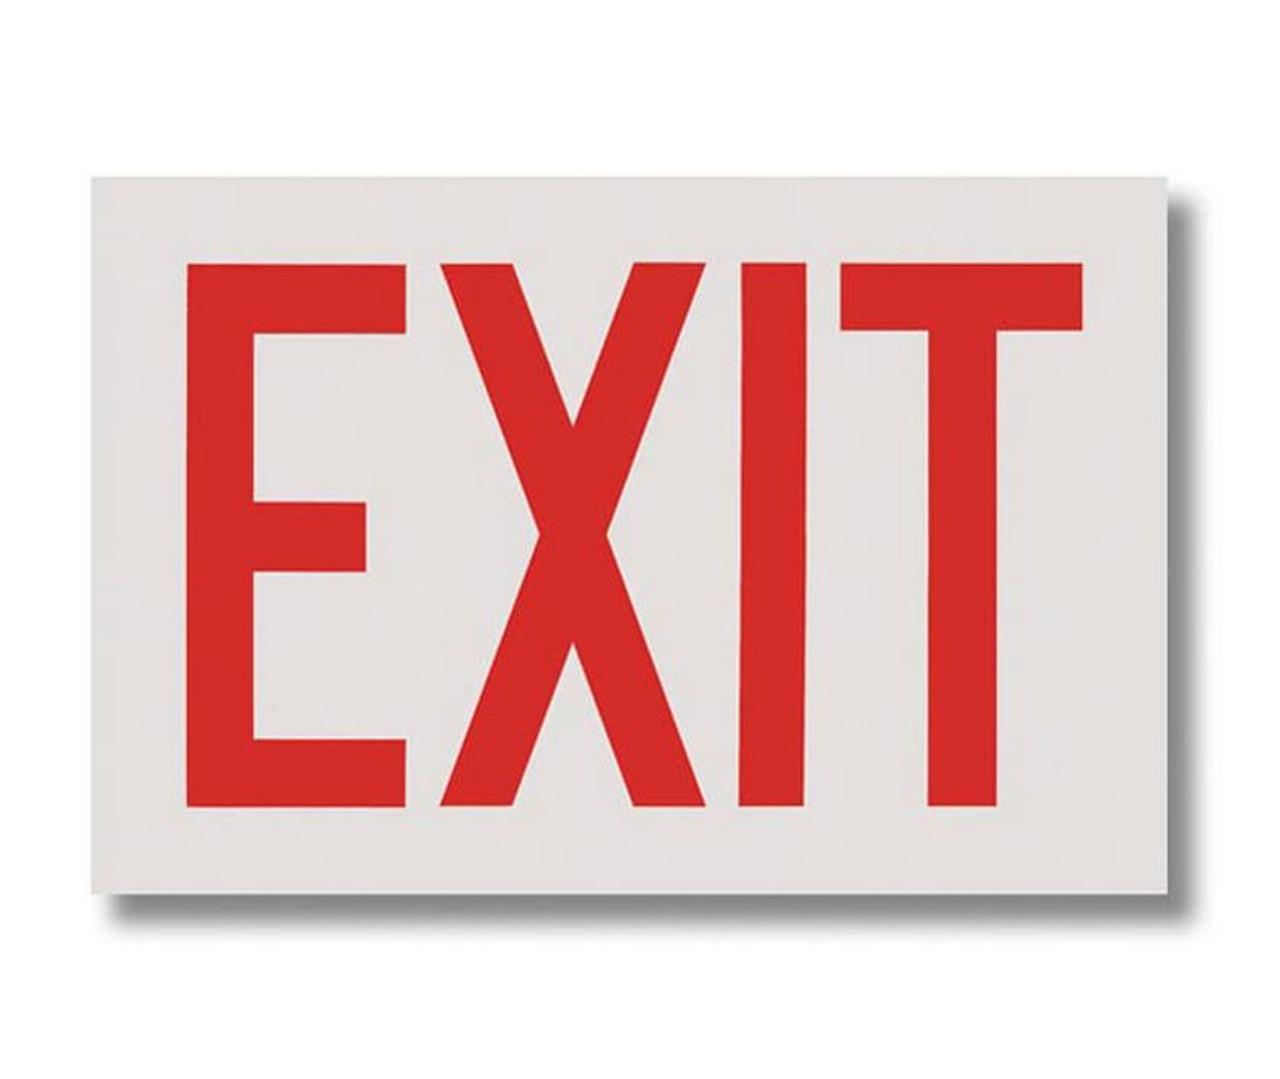 "BL112W Self-adhesive Vinyl White Exit Sign 12"" x 8"""